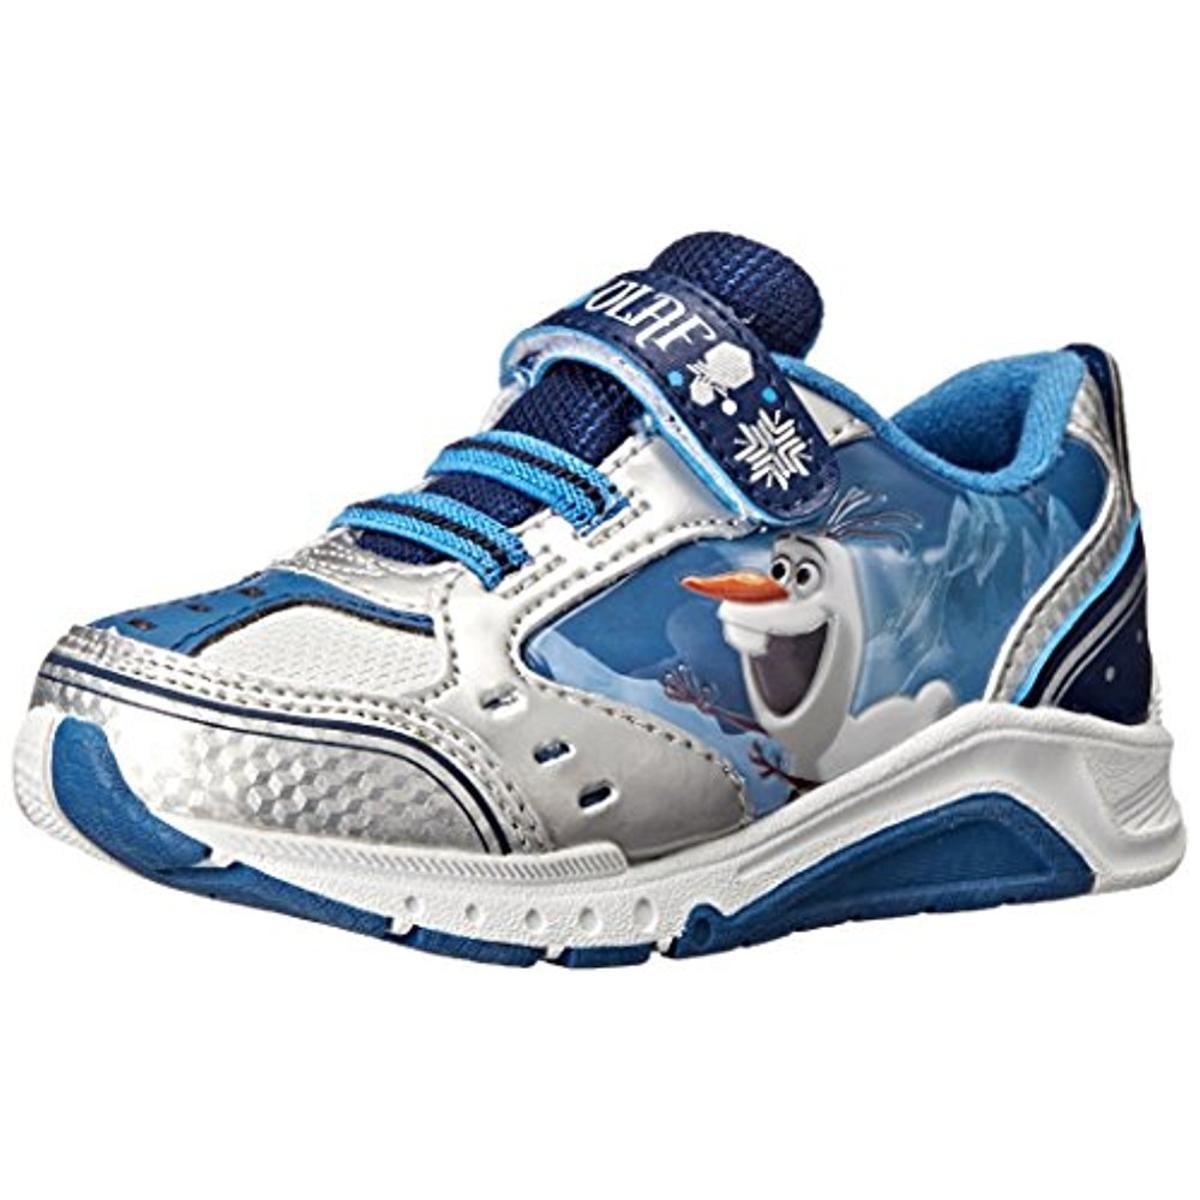 Disney Boys Olaf Frozen Light Up Tennis Shoes